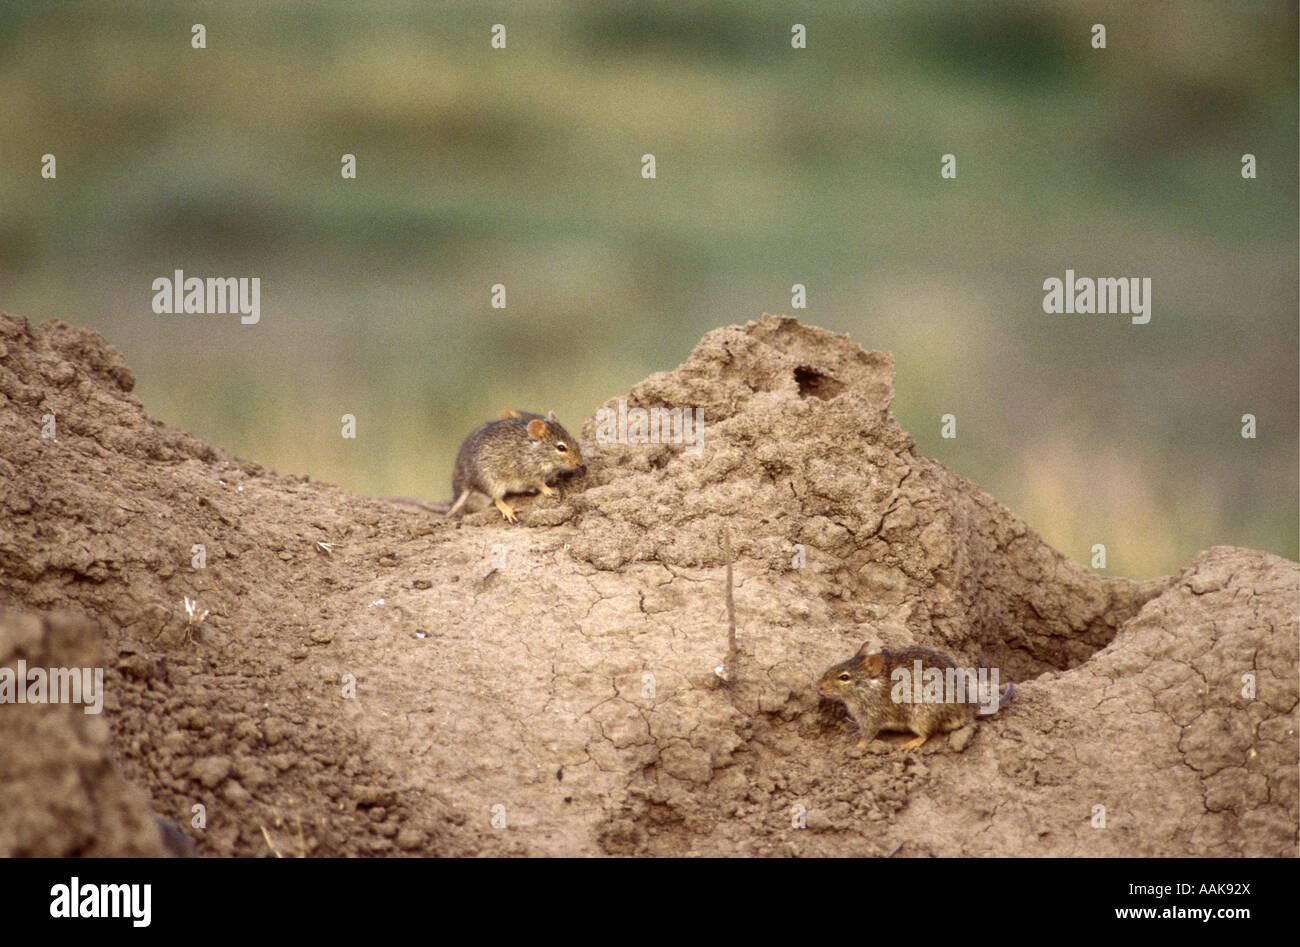 Zwei Ungestreifte Grass Ratten auf eine Termite Hügel Serengeti Nationalpark Tansania Ostafrika Stockbild